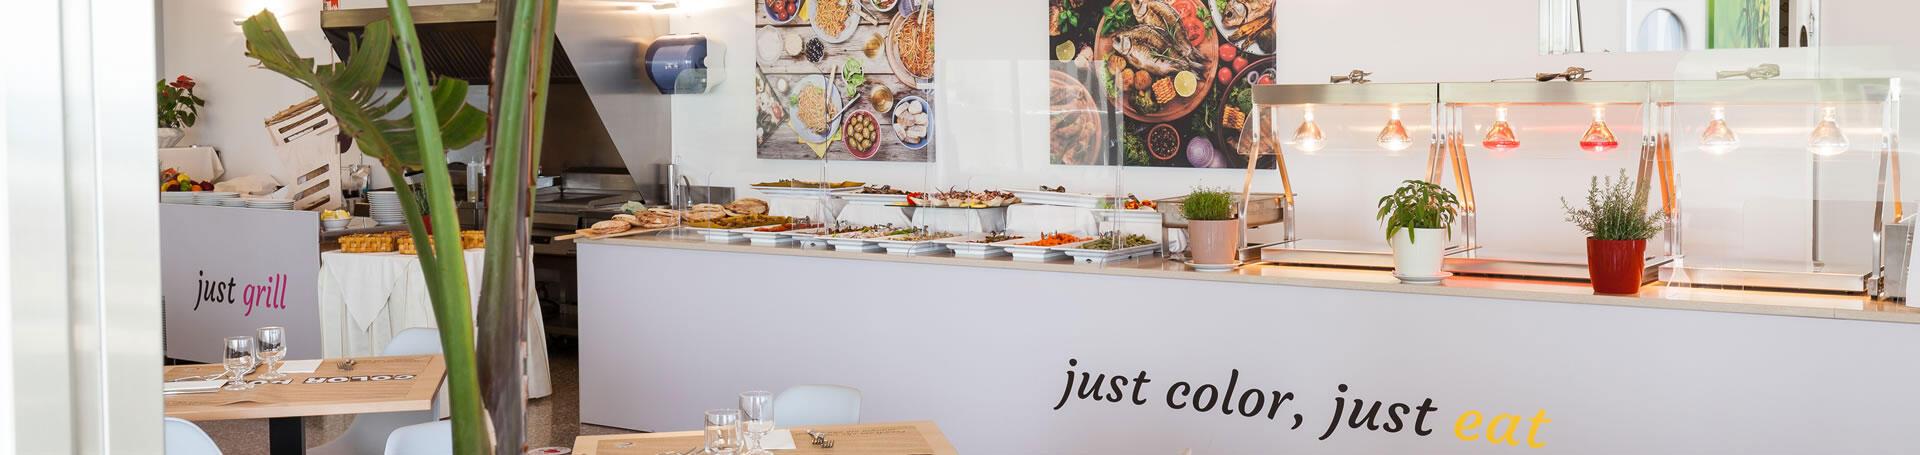 hotelermitage it ristorante-bellaria 010